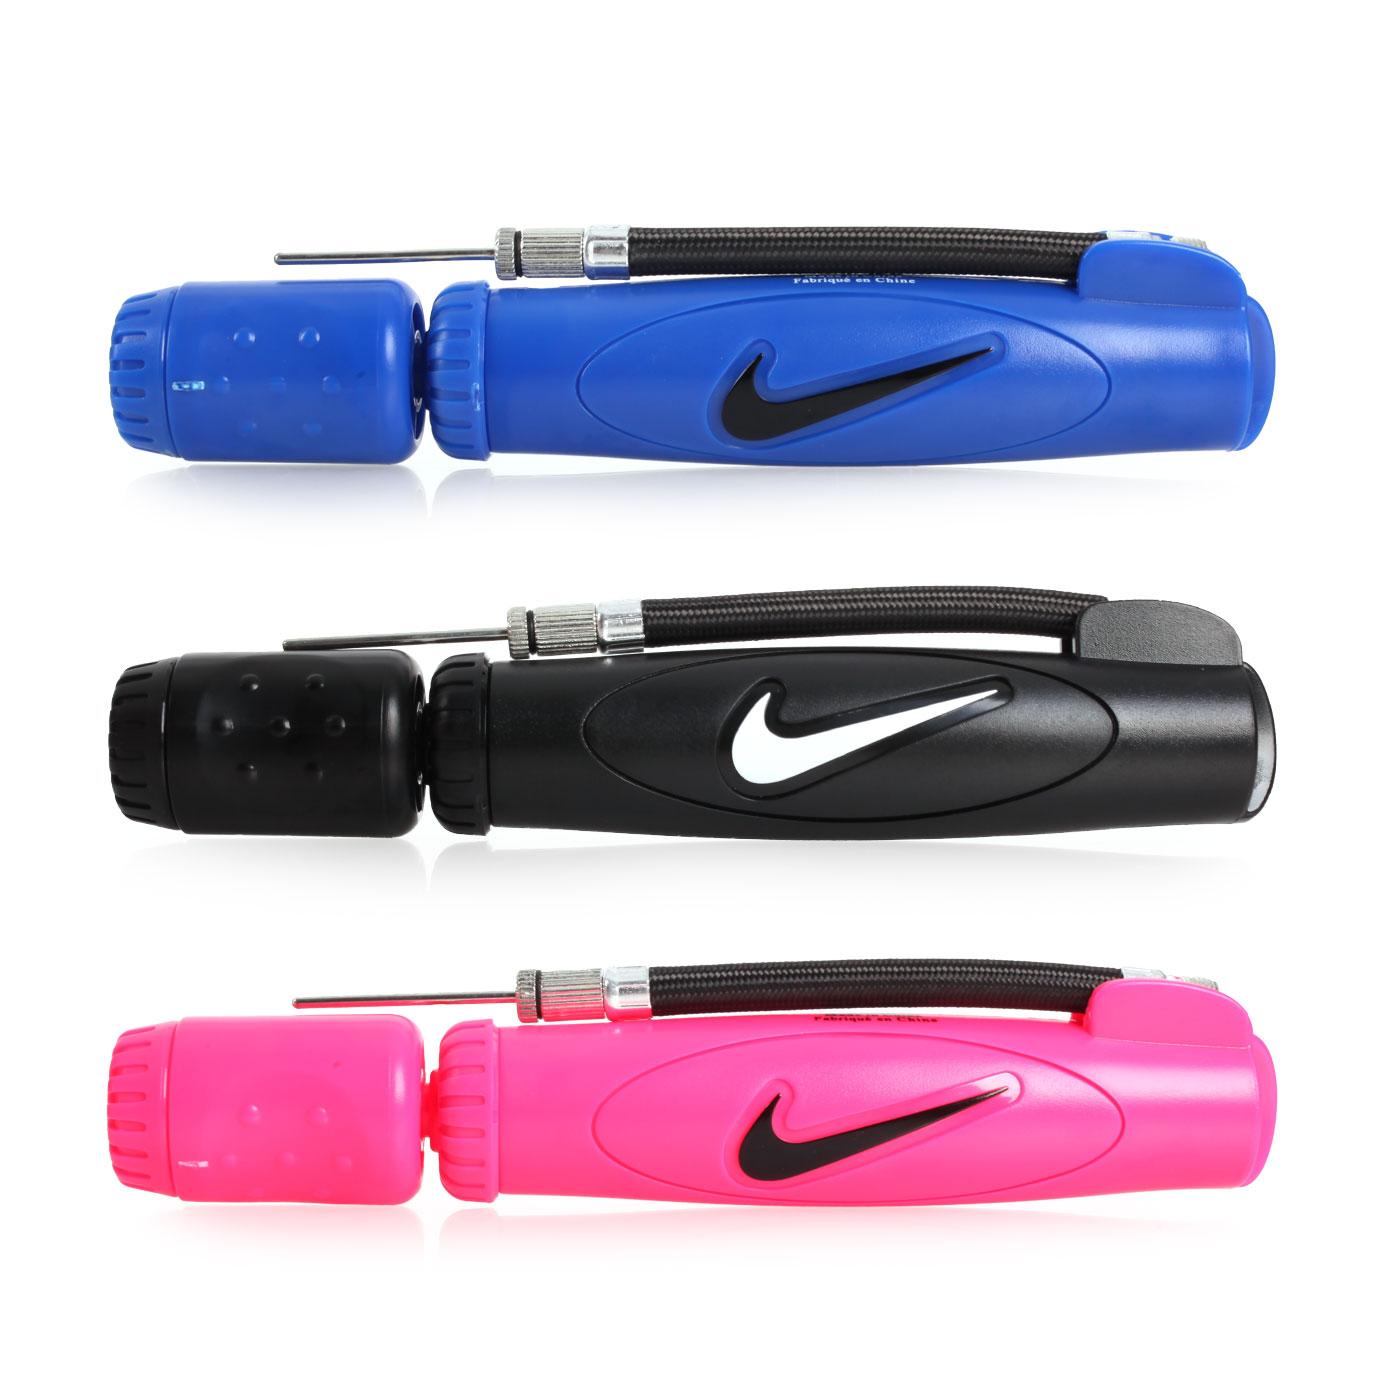 NIKE 打氣筒 (籃球 足球 排球 躲避球 隨身 攜帶型【99301563】≡排汗專家≡